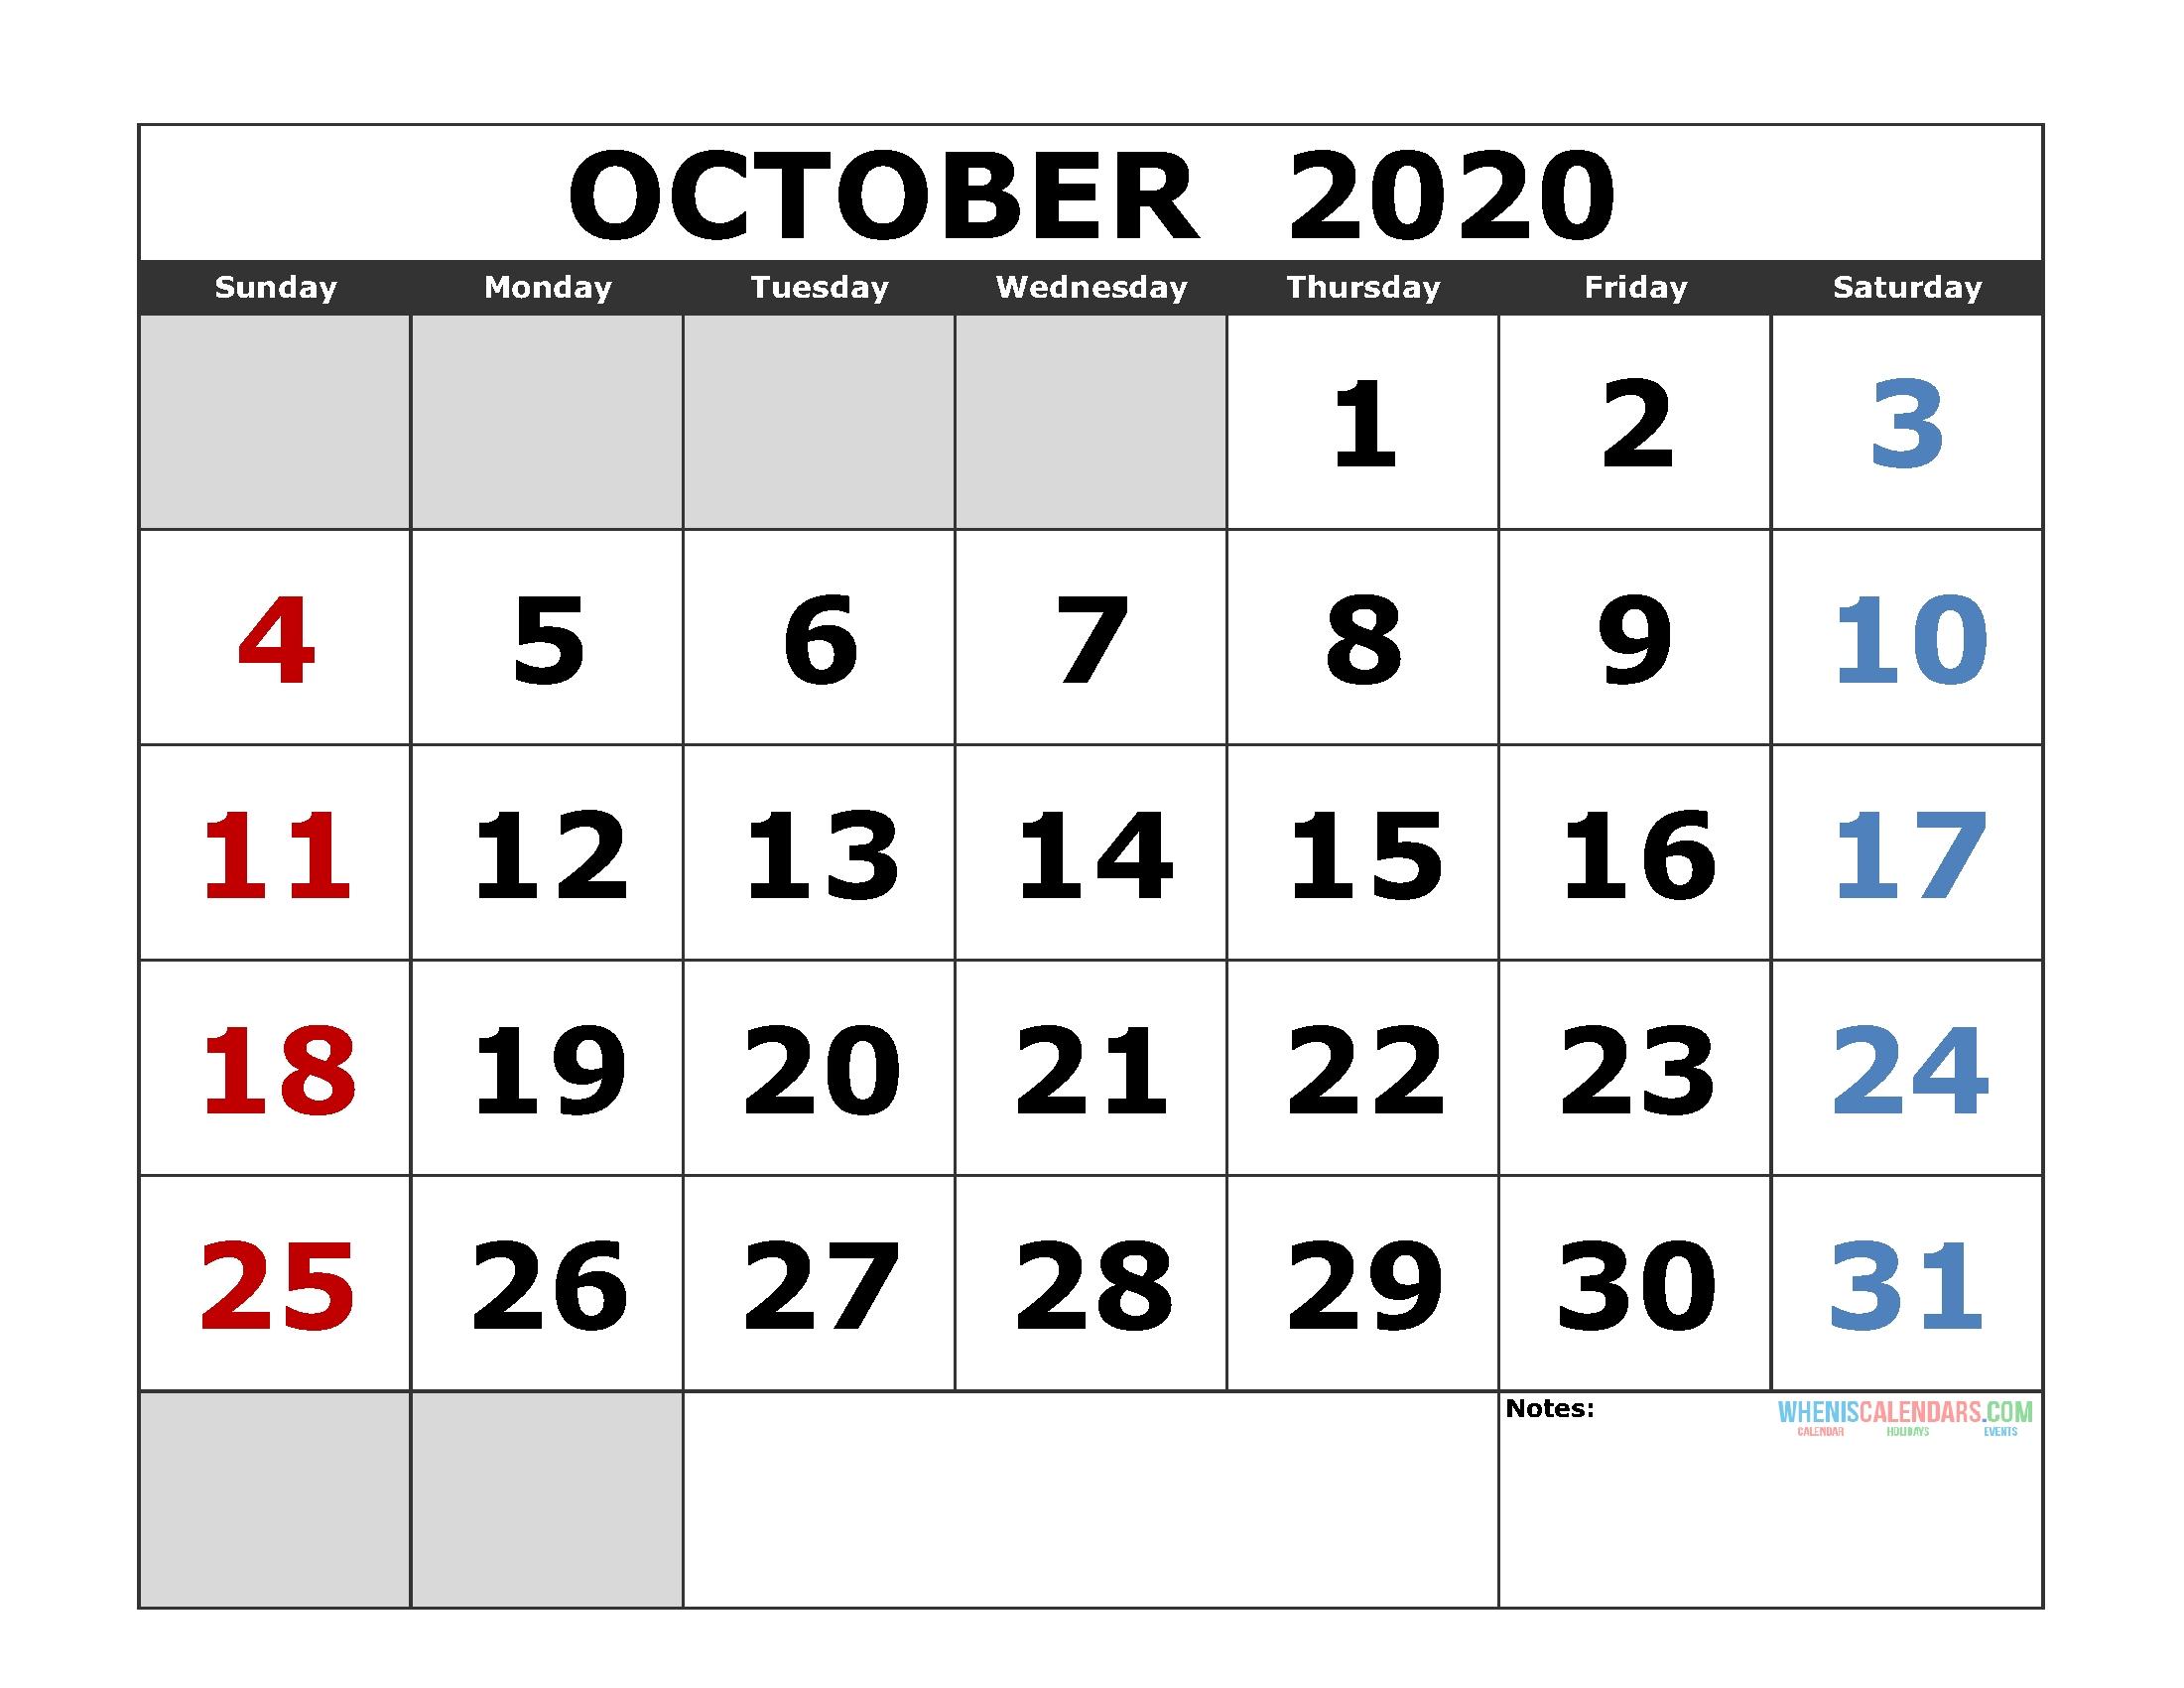 October 2020 Printable Calendar Template Excel, Pdf, Image-Printable Jewish Calendar For October 2020 With Holidays